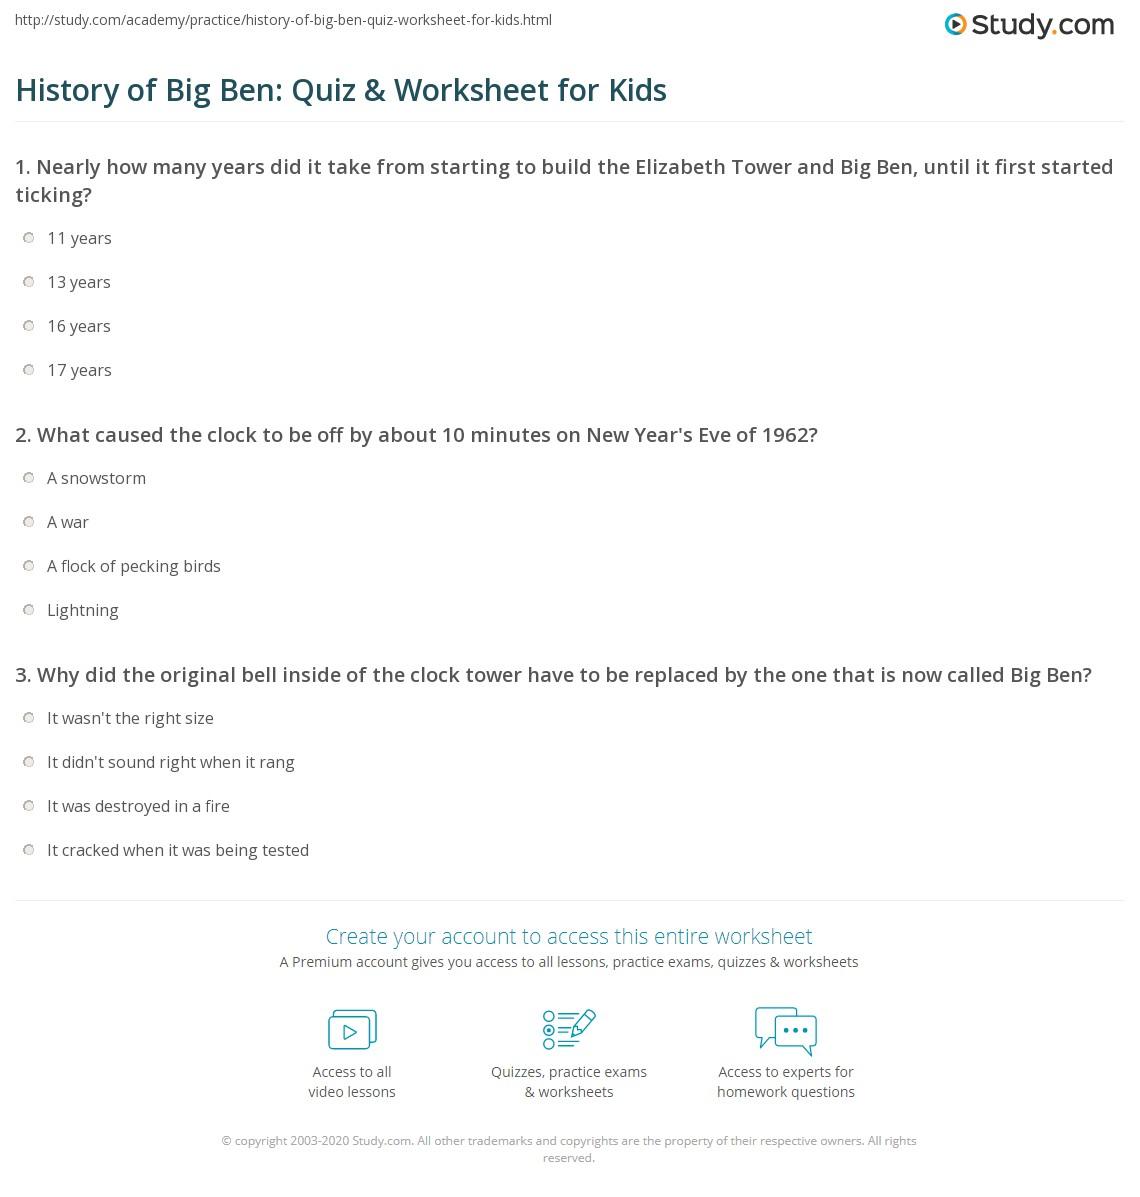 History of Big Ben: Quiz & Worksheet for Kids   Study.com